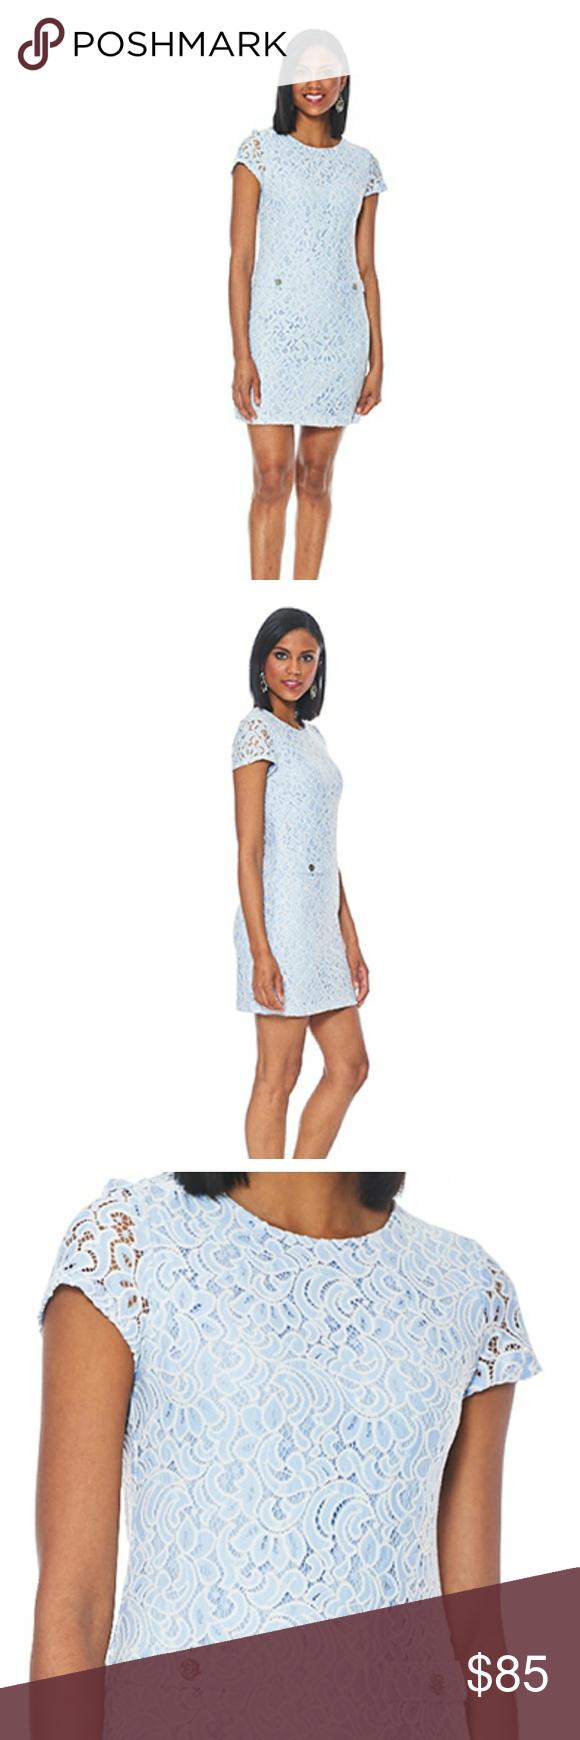 e3a556f32d Tommy Hilfiger Womens Floral Outline Lace Shirt Dress   Toffee Art